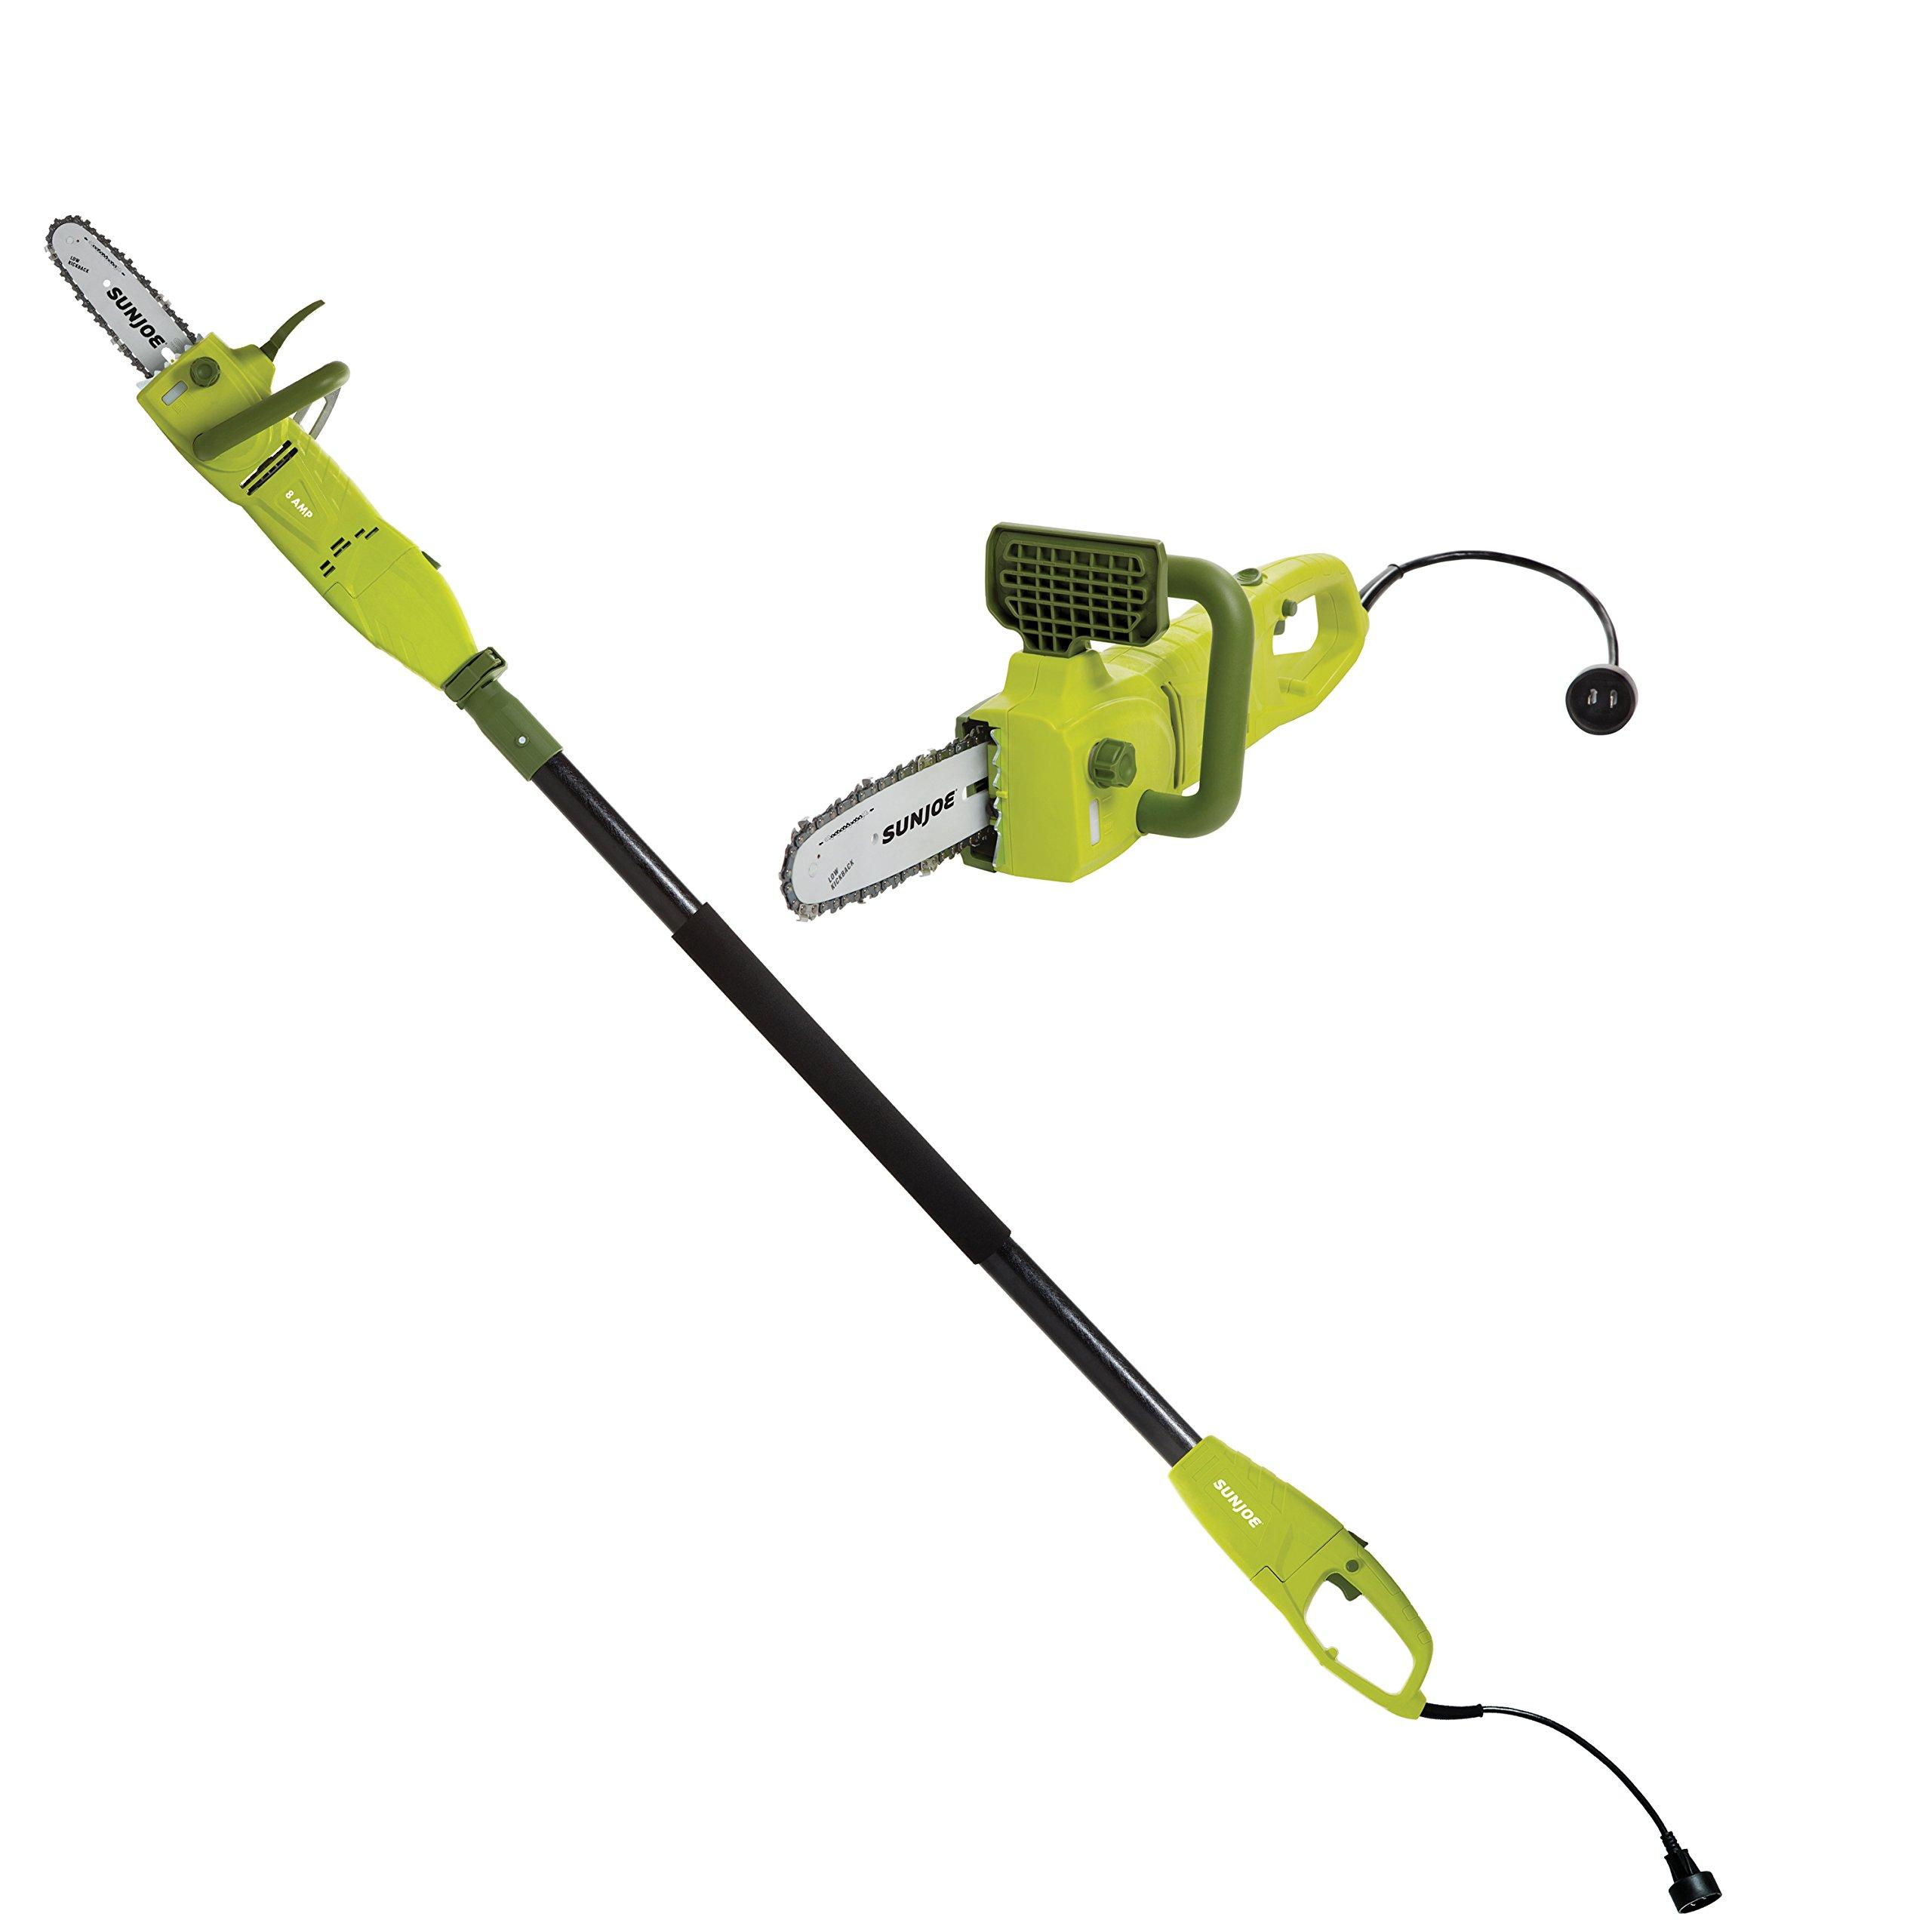 Sun Joe SWJ806E 8-Inch 8-Amp Electric Pole Chain Saw